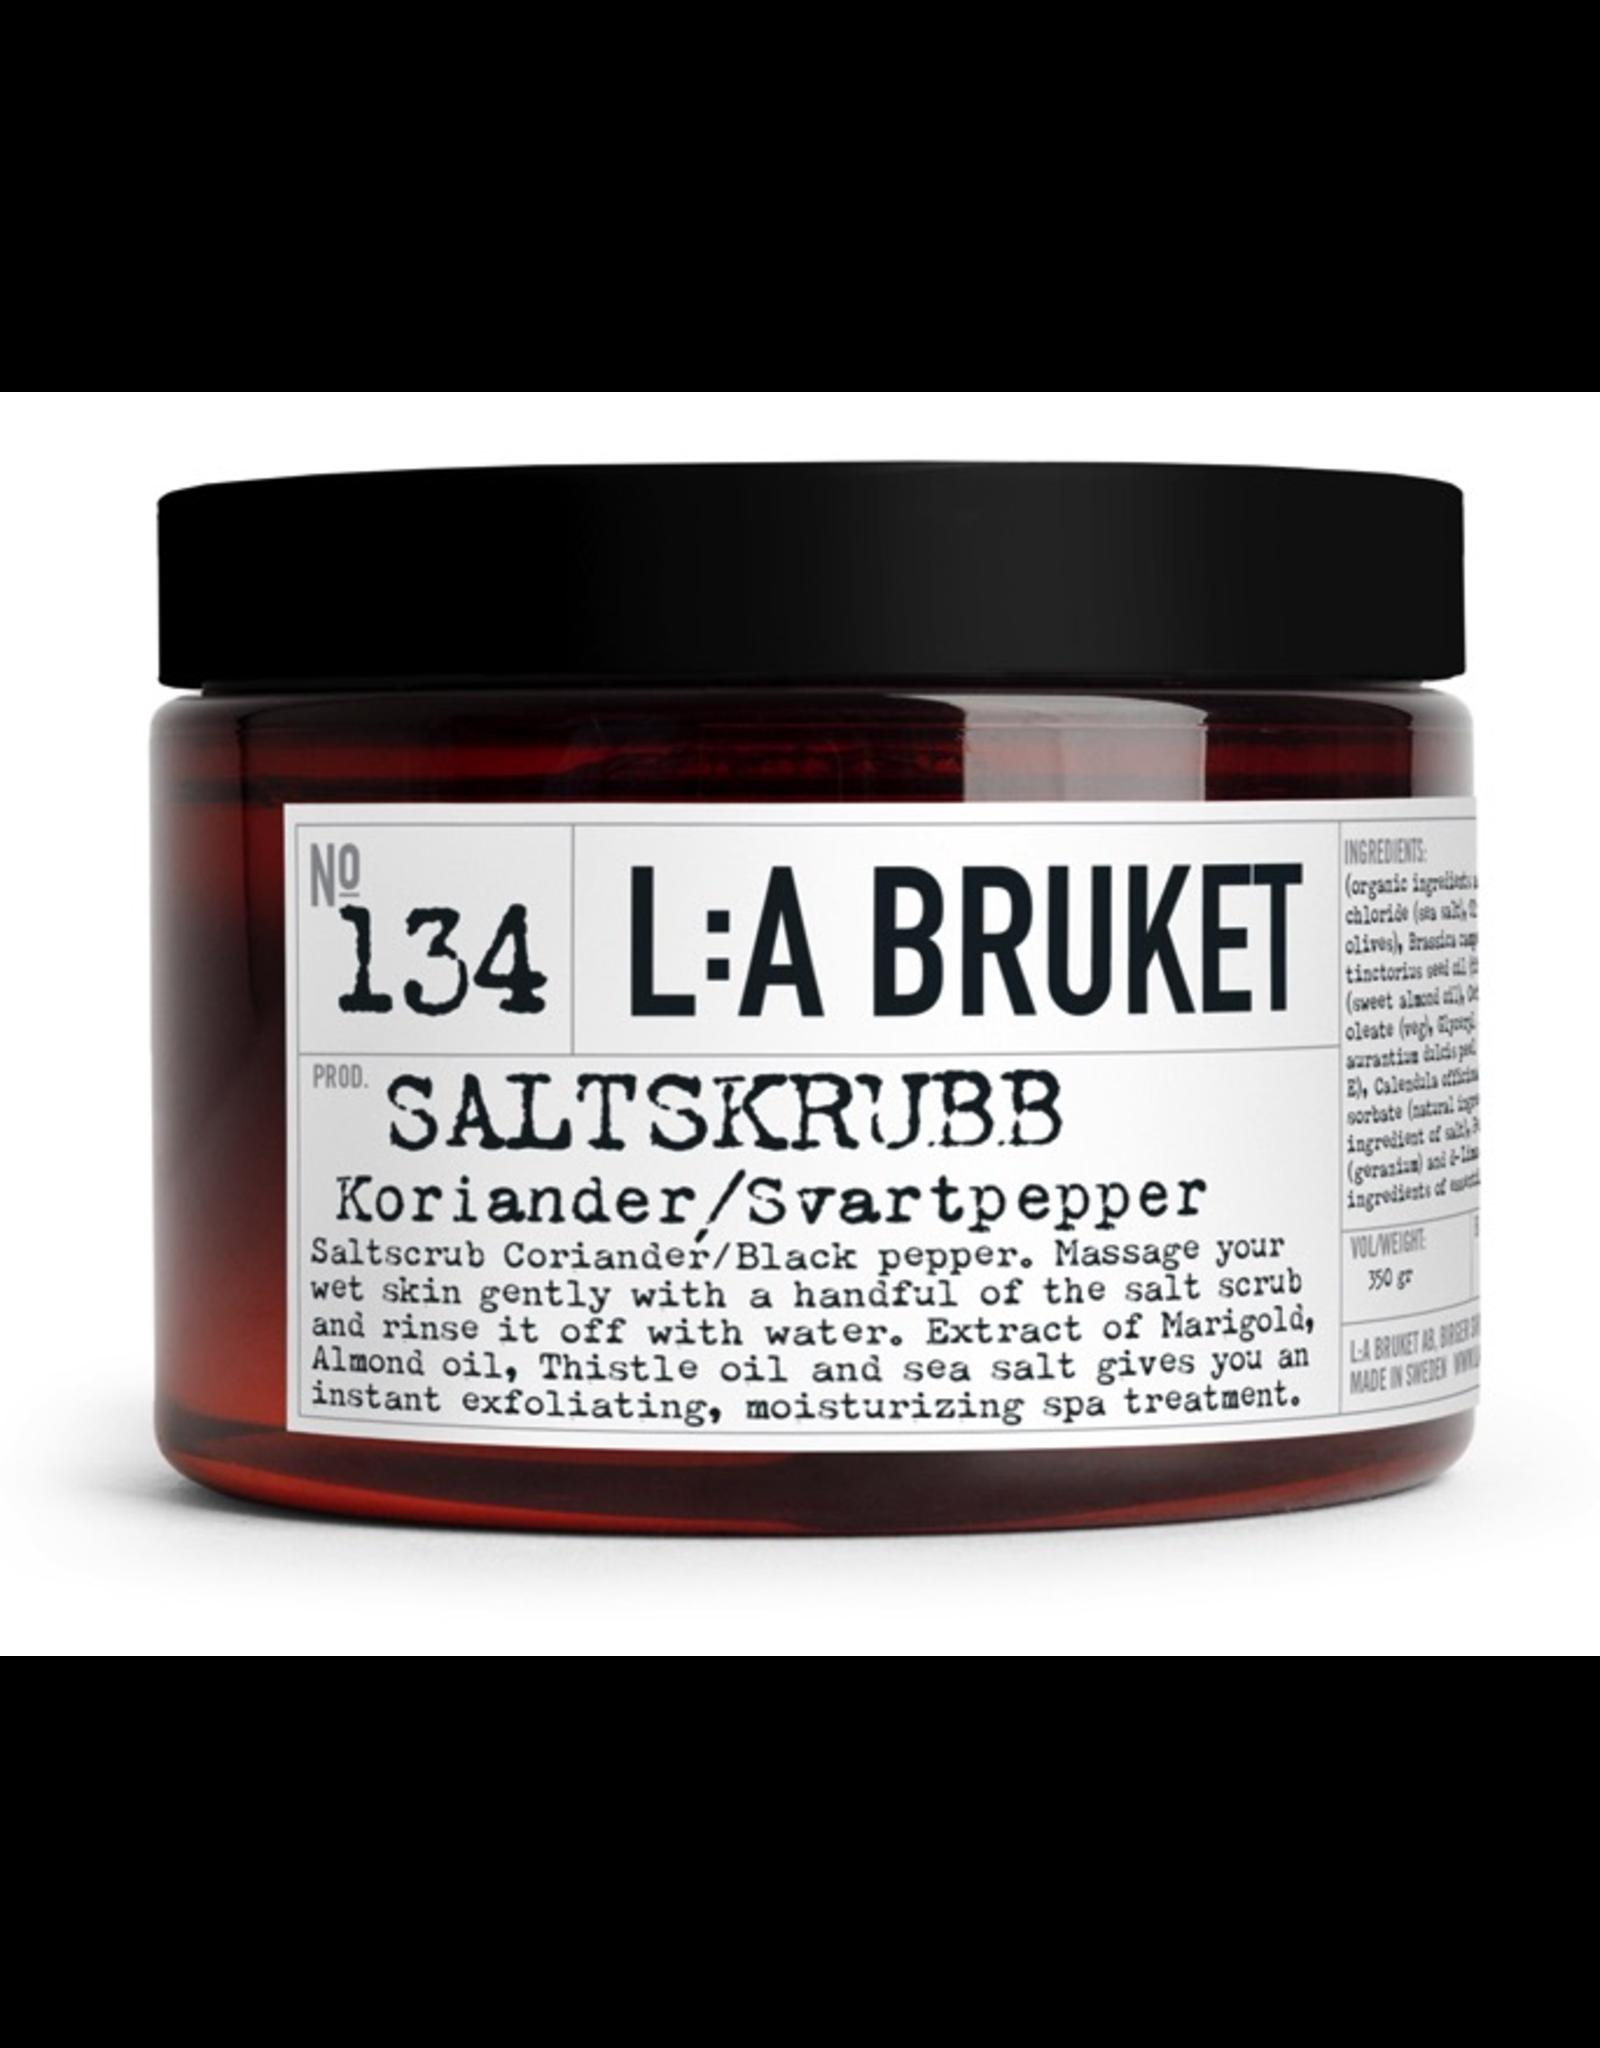 LA BRUKET N°134 Salt Scrub Coriander/Black Pepper 350Ml